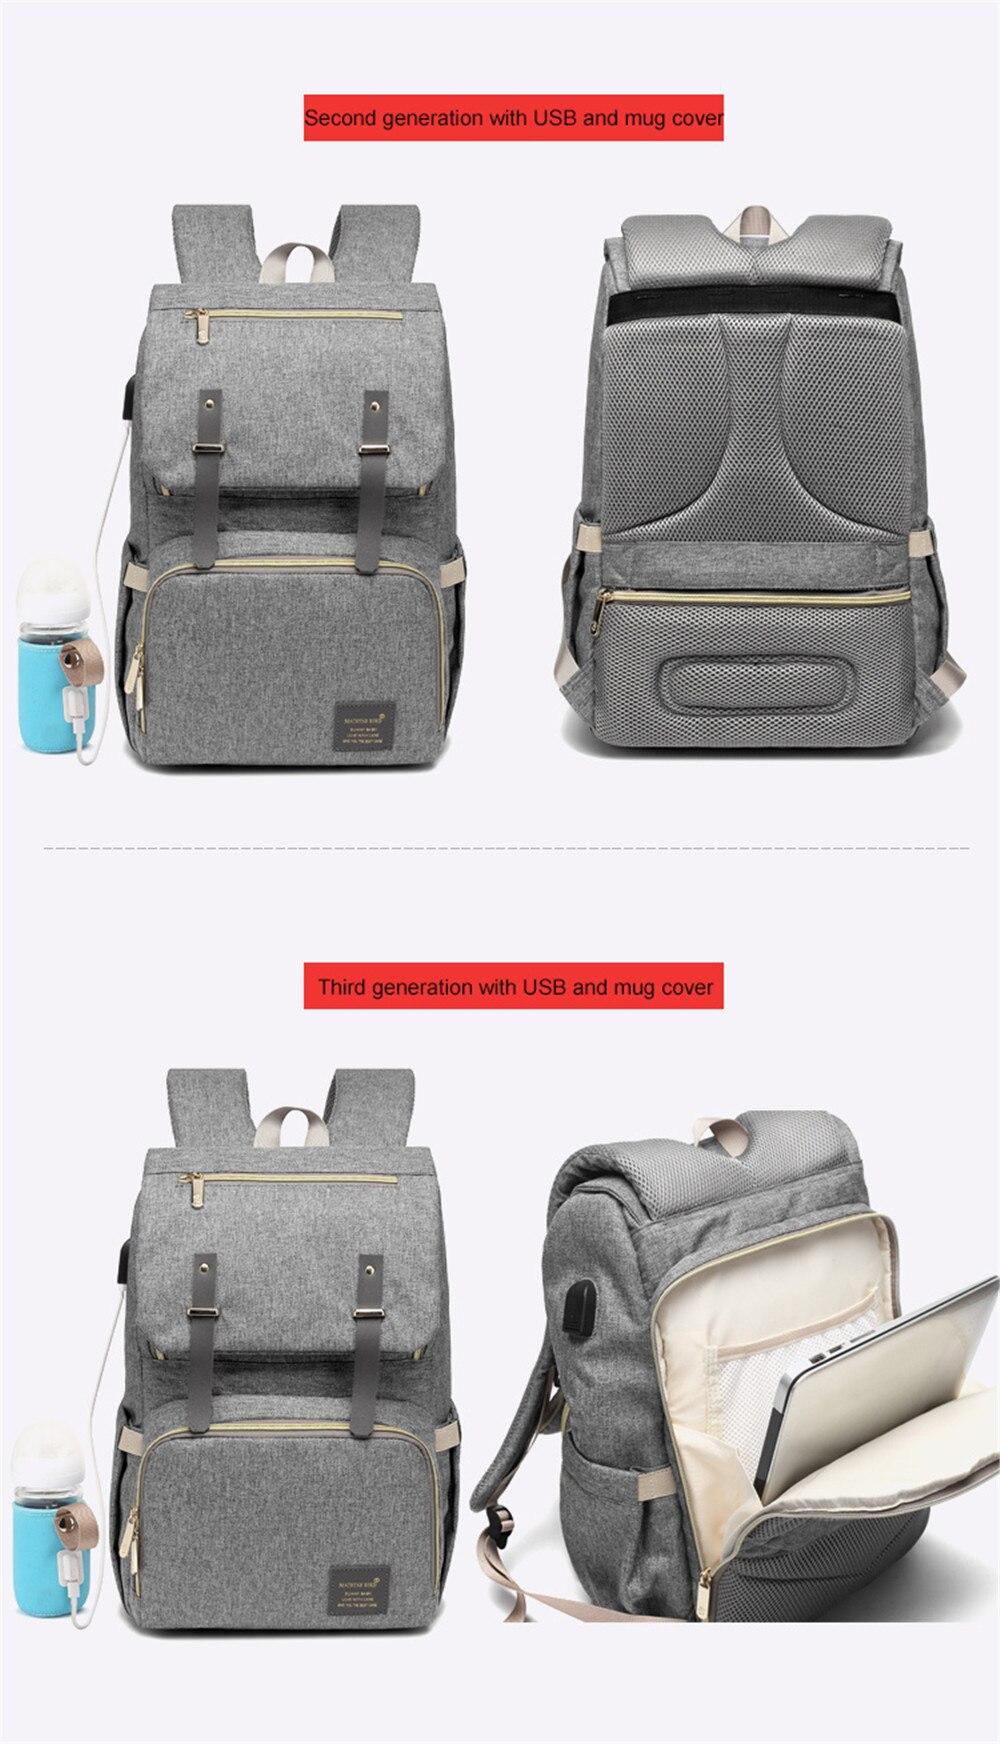 HTB1FhgEM4jaK1RjSZFAq6zdLFXaN Fashion Large Capacity Baby Nappy Bag Diaper Bag Purse Multifunction USB Mummy Travel Backpack Women Nursing Bags For Mom Daddy